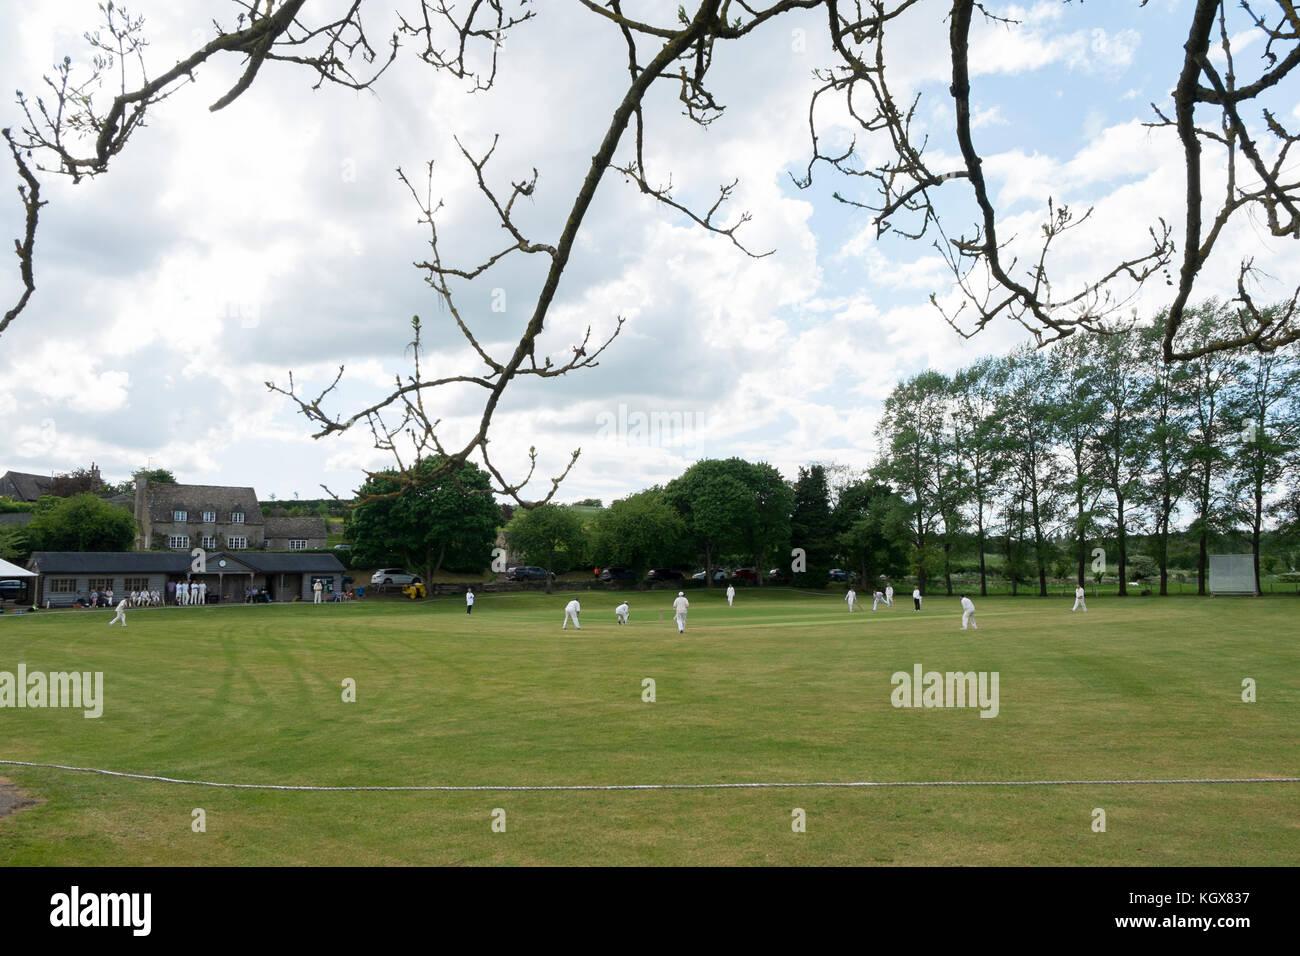 Cricket match on the green at Swinbrook, Oxfordshire, UK. Stock Photo